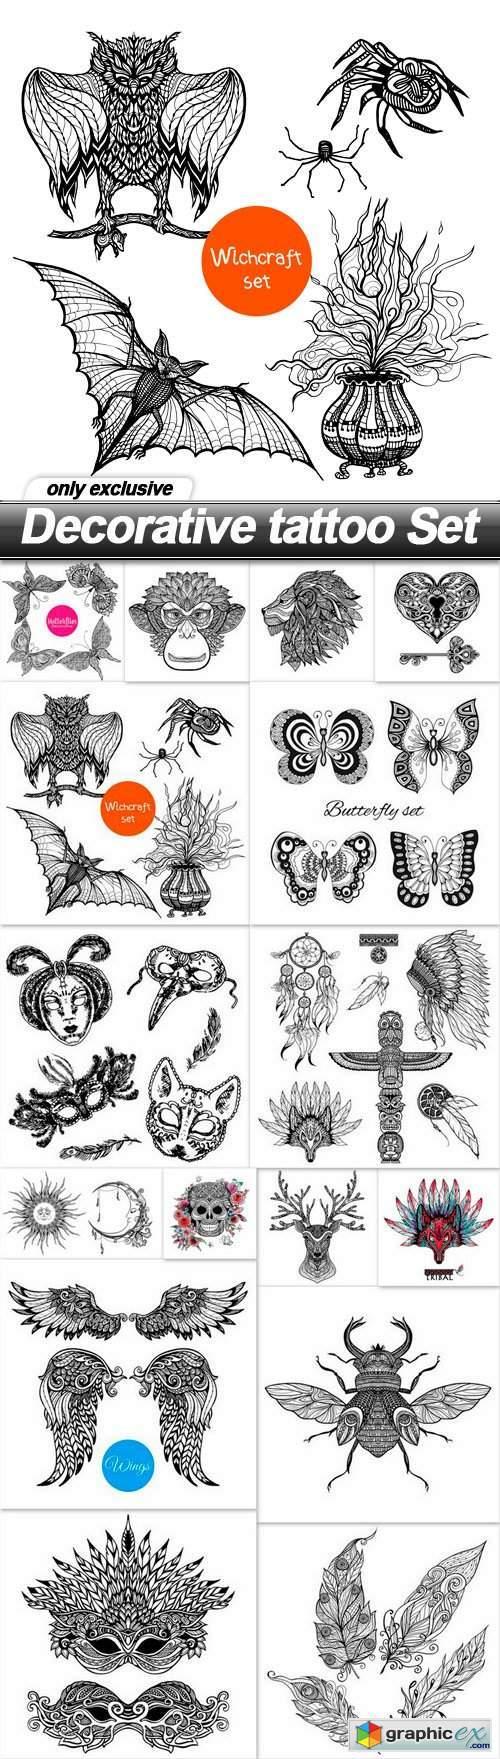 Decorative tattoo Set - 16 EPS